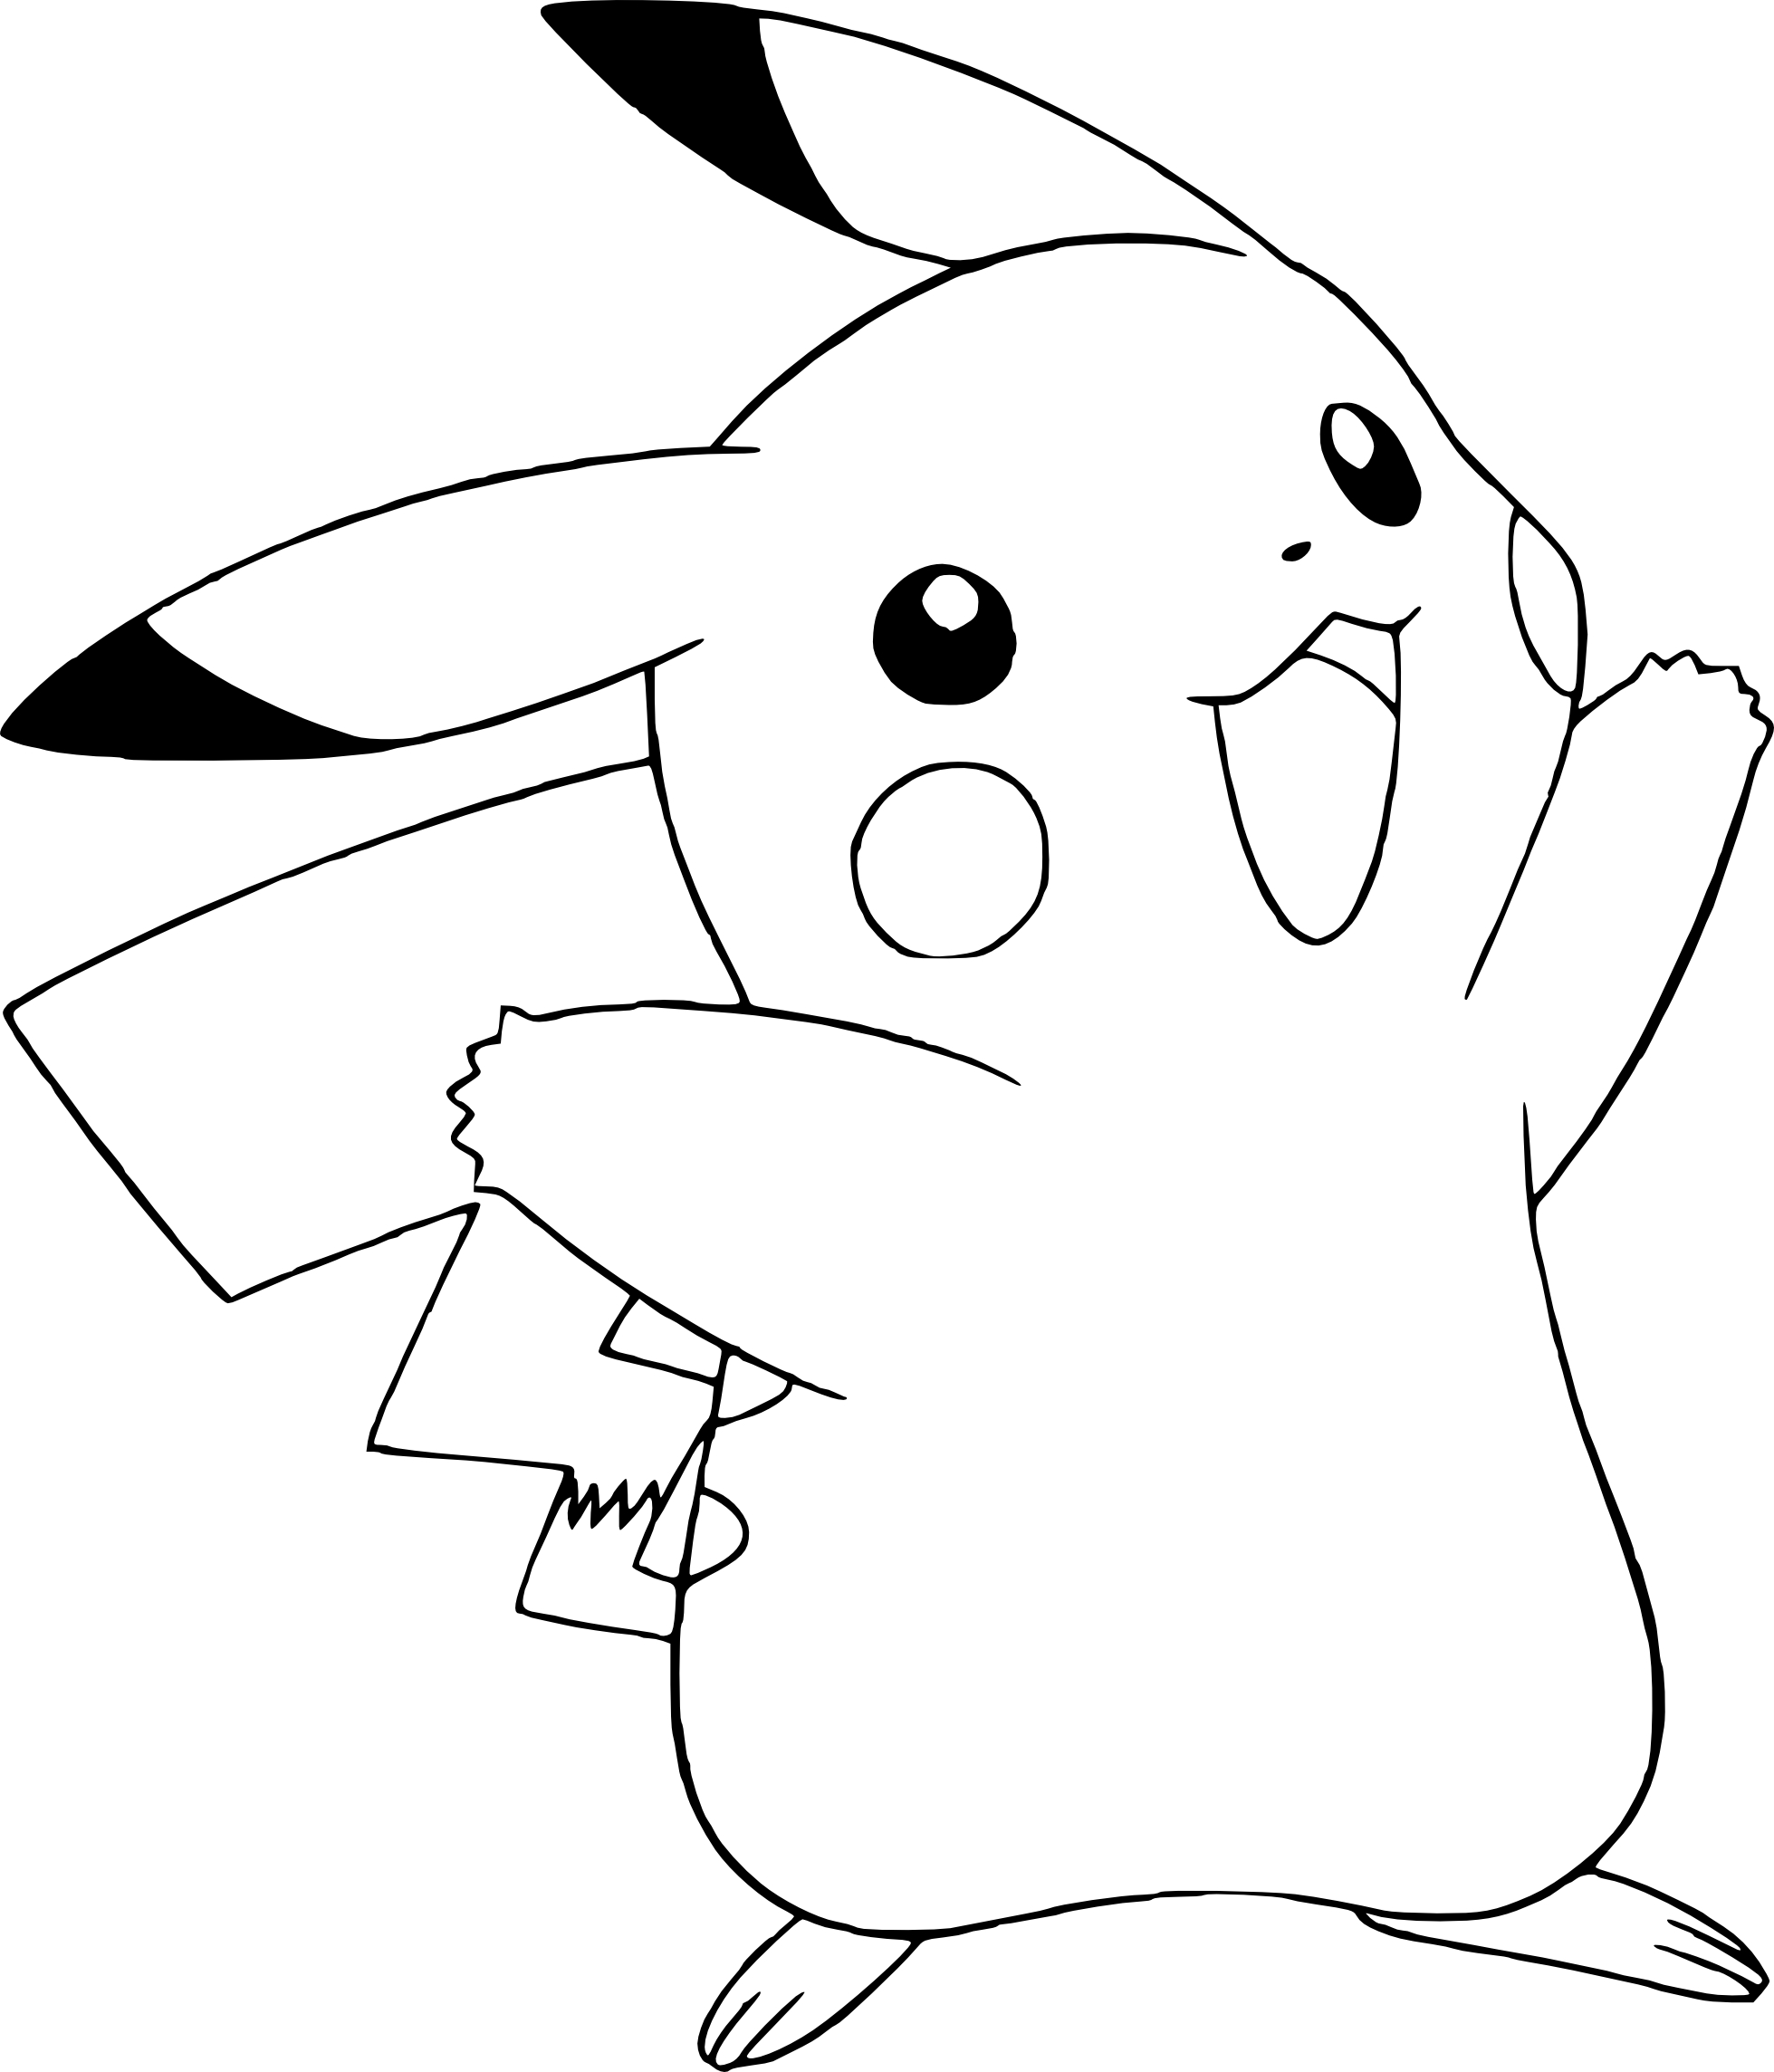 Coloriage pikachu pokemon imprimer - Pikachu a imprimer ...